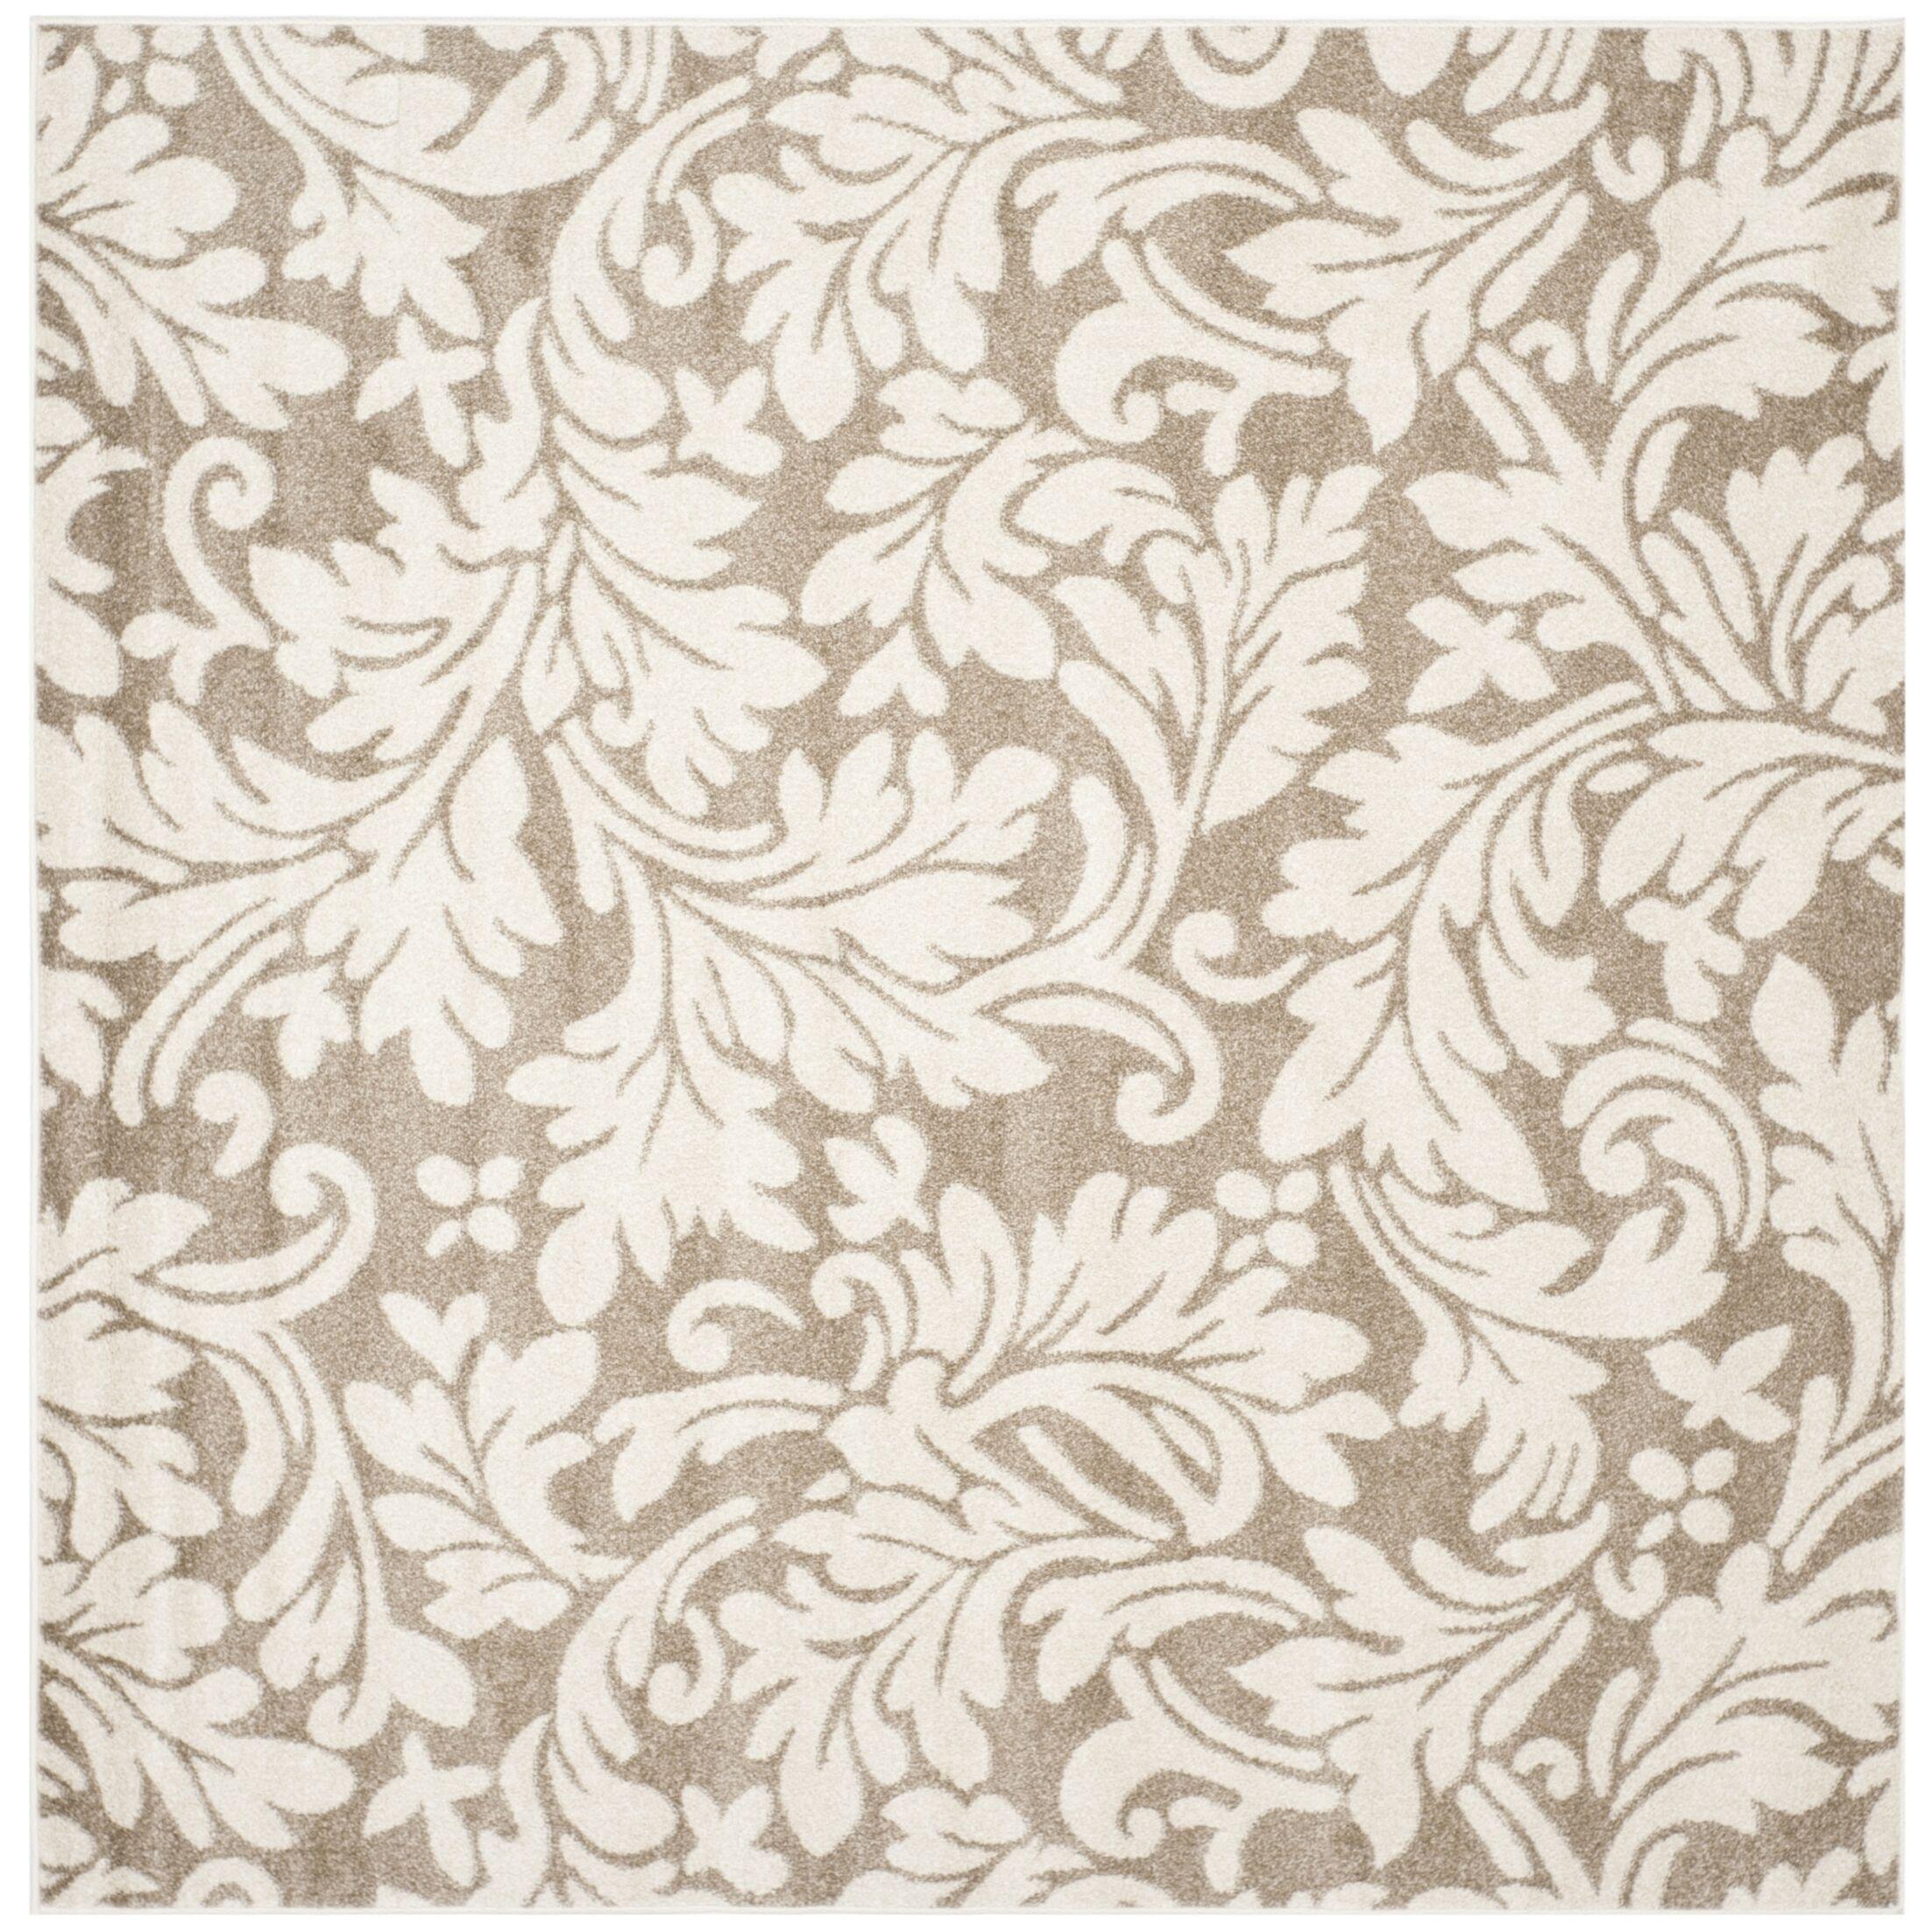 Maritza Floral Dark Grey/Beige Area Rug Rug Size: Square 9'